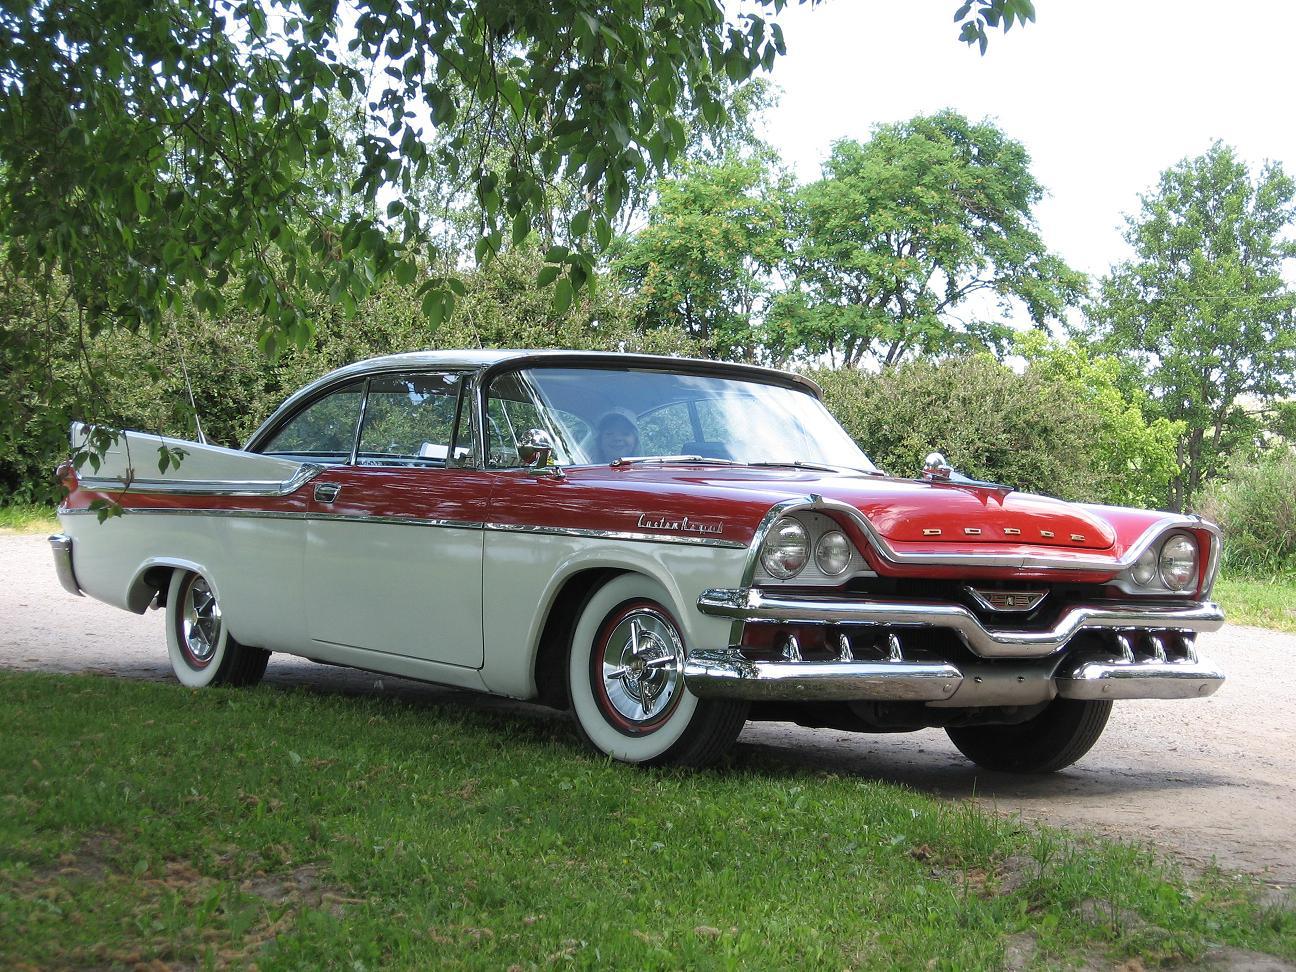 Unusual Old Dodge Car Models Ideas - Classic Cars Ideas - boiq.info